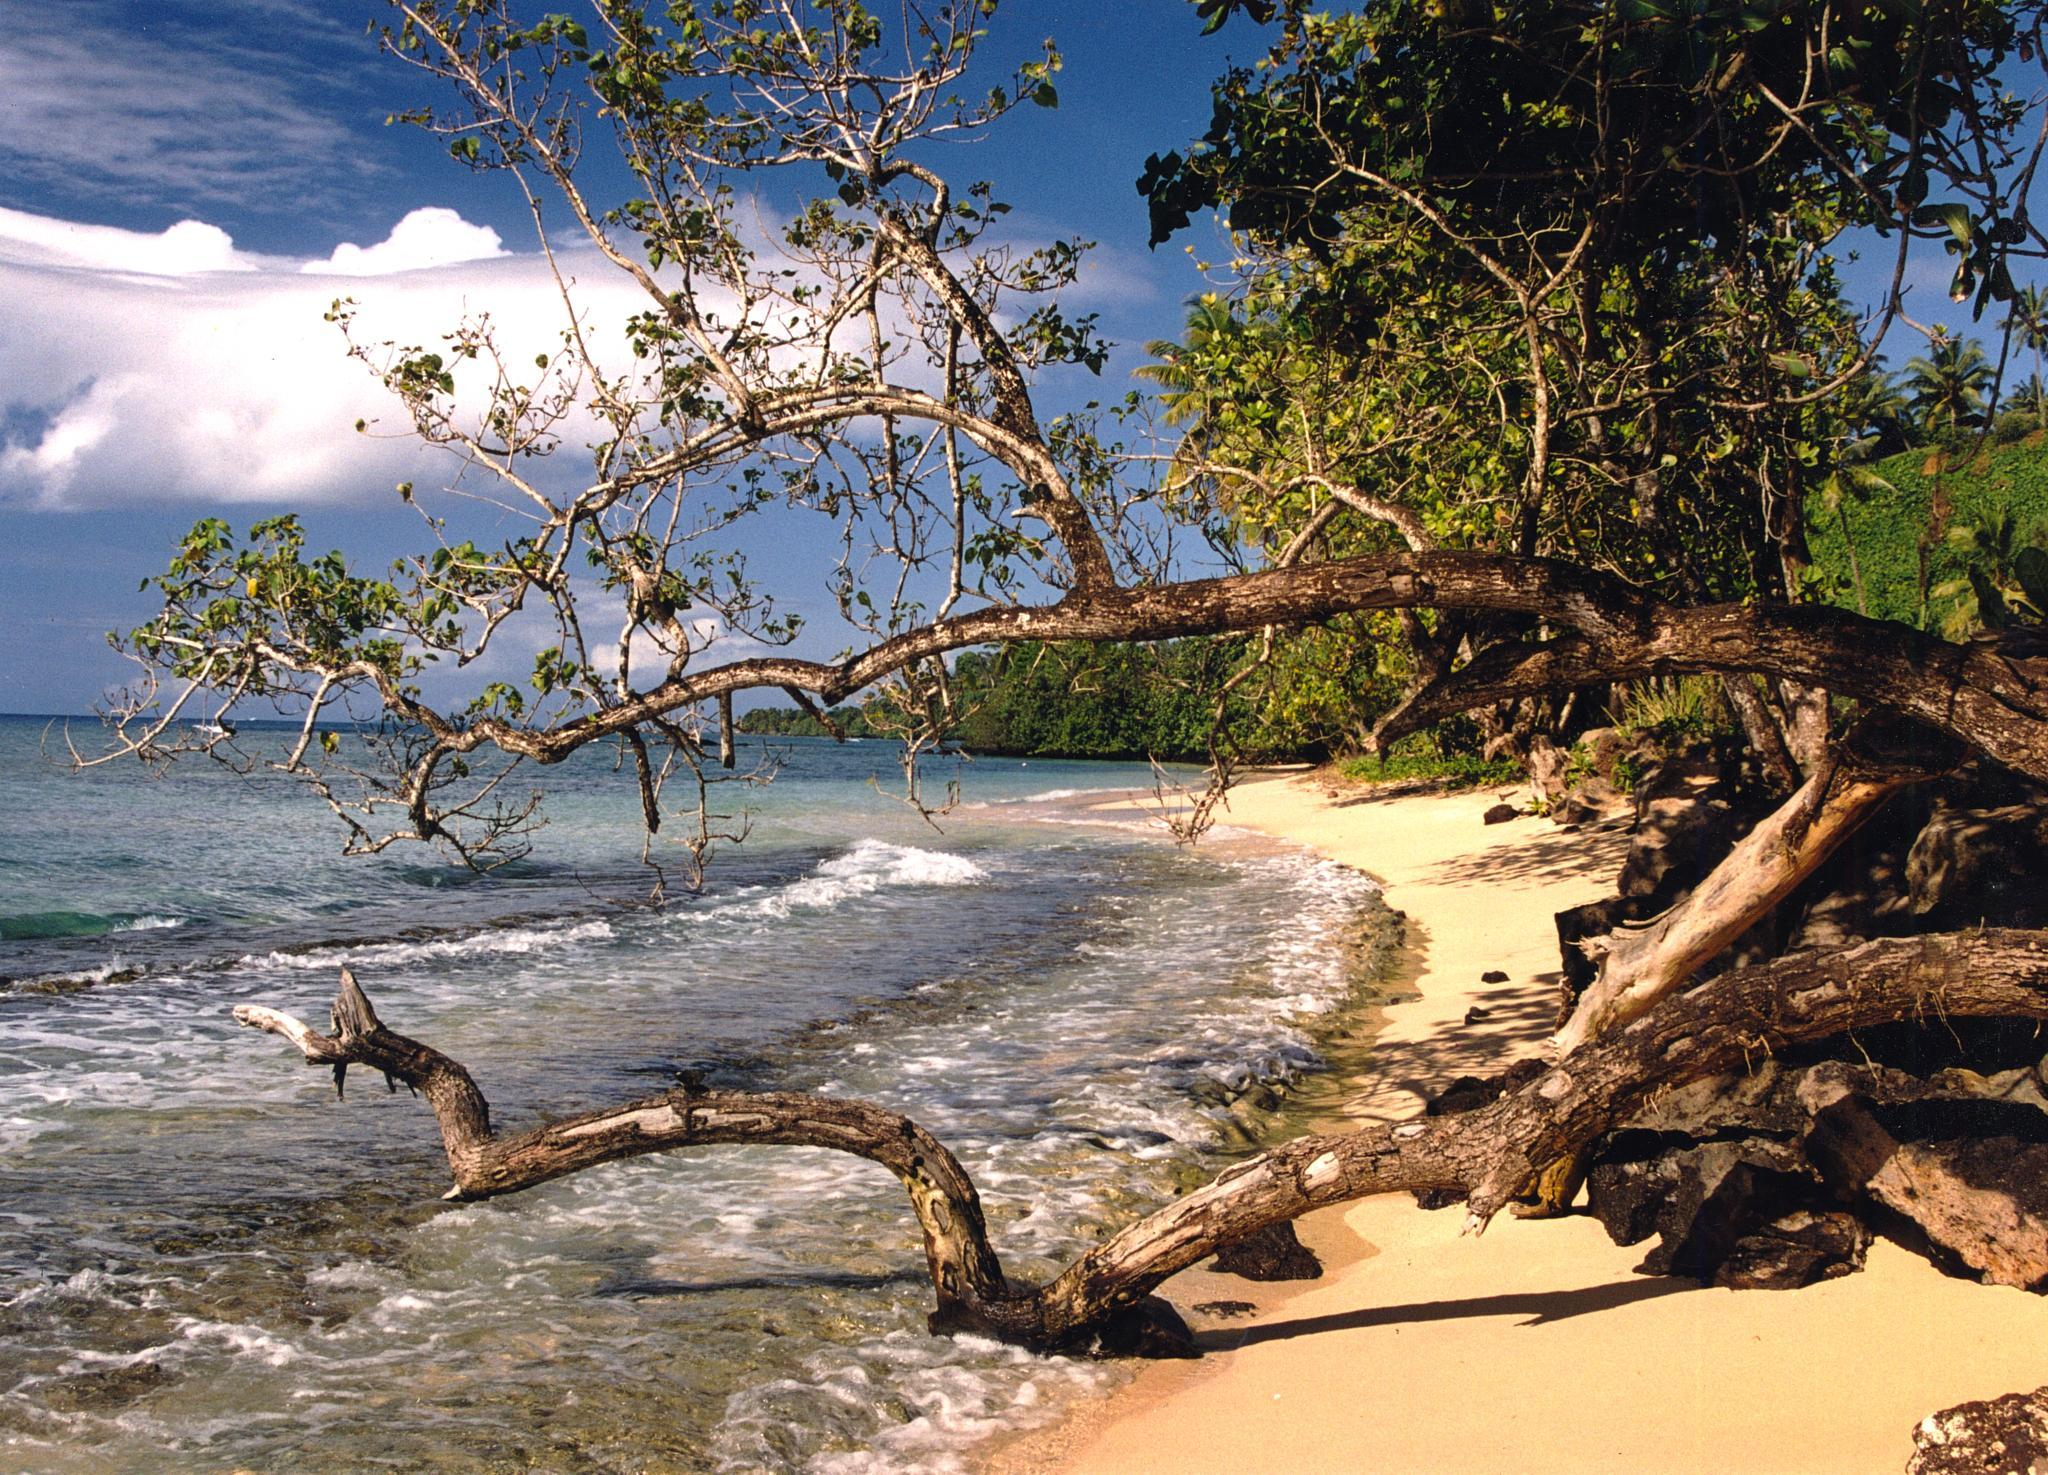 Tavioni Fiji by Peter Puddiphatt